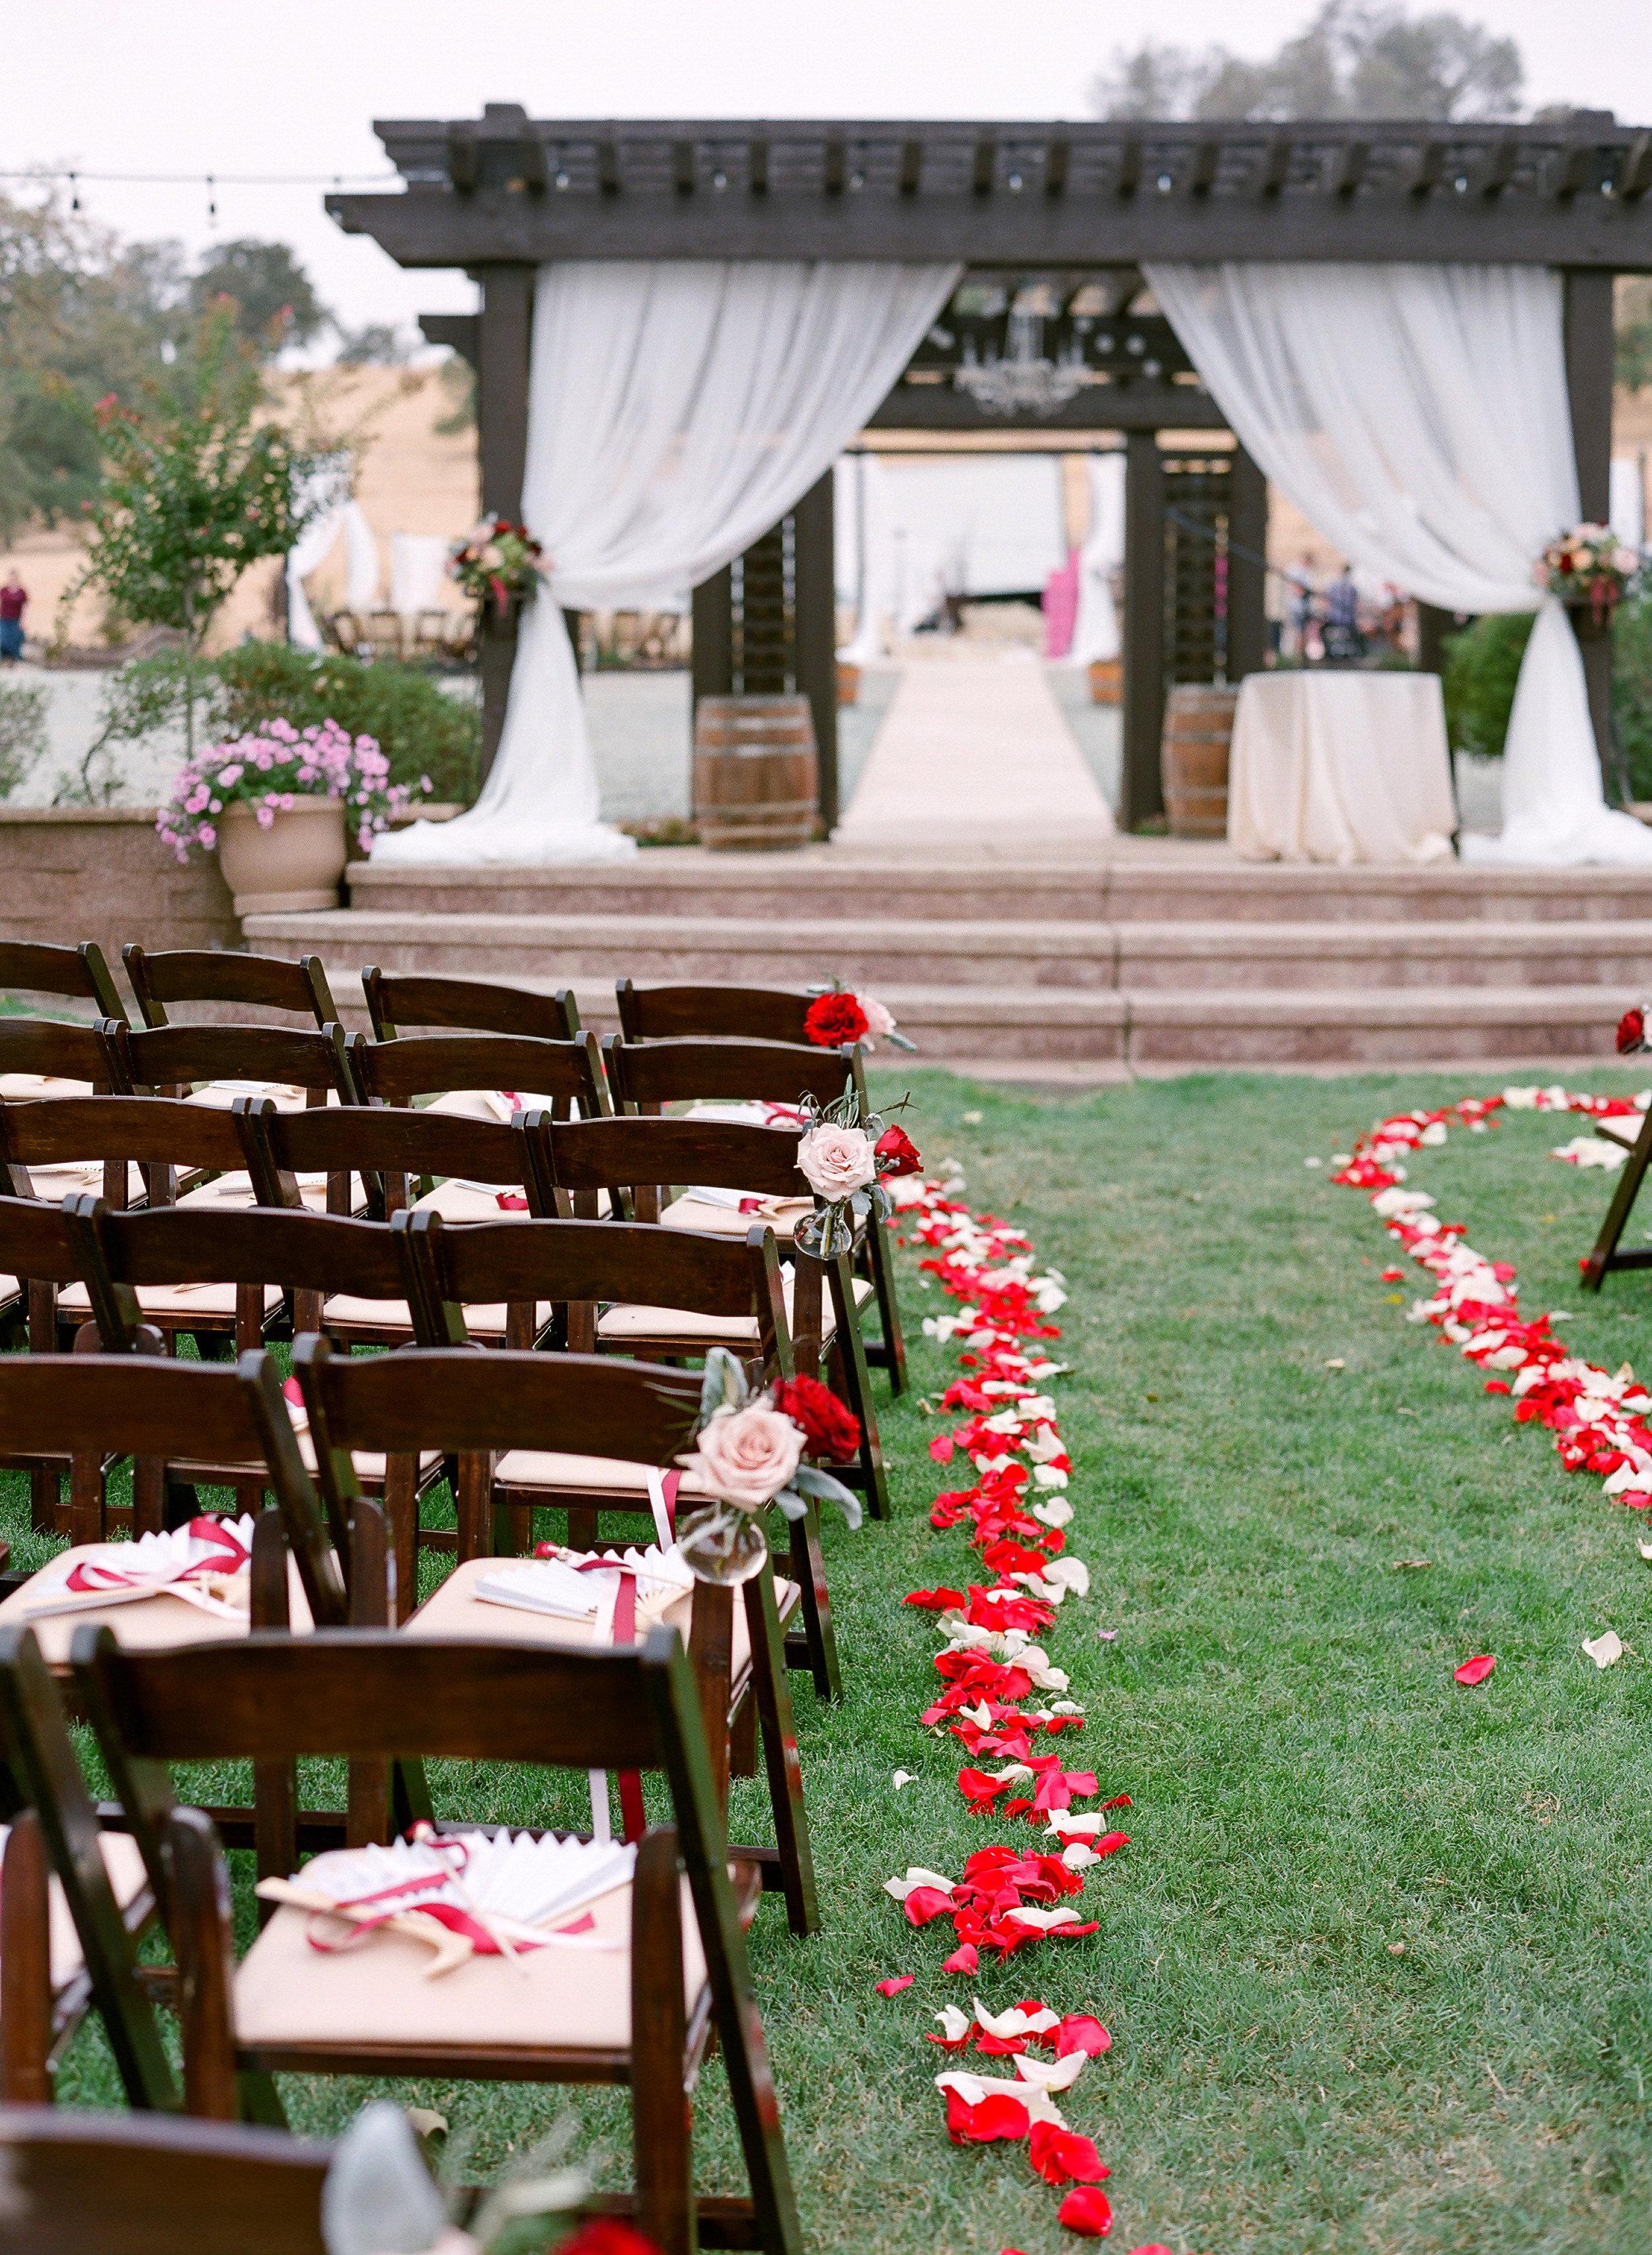 Wedding_Aisle_Arrangements_Petals_Draping_Red_Gold_Pink_Rancho_Victoria_Vineyard_Northern_California.jpg